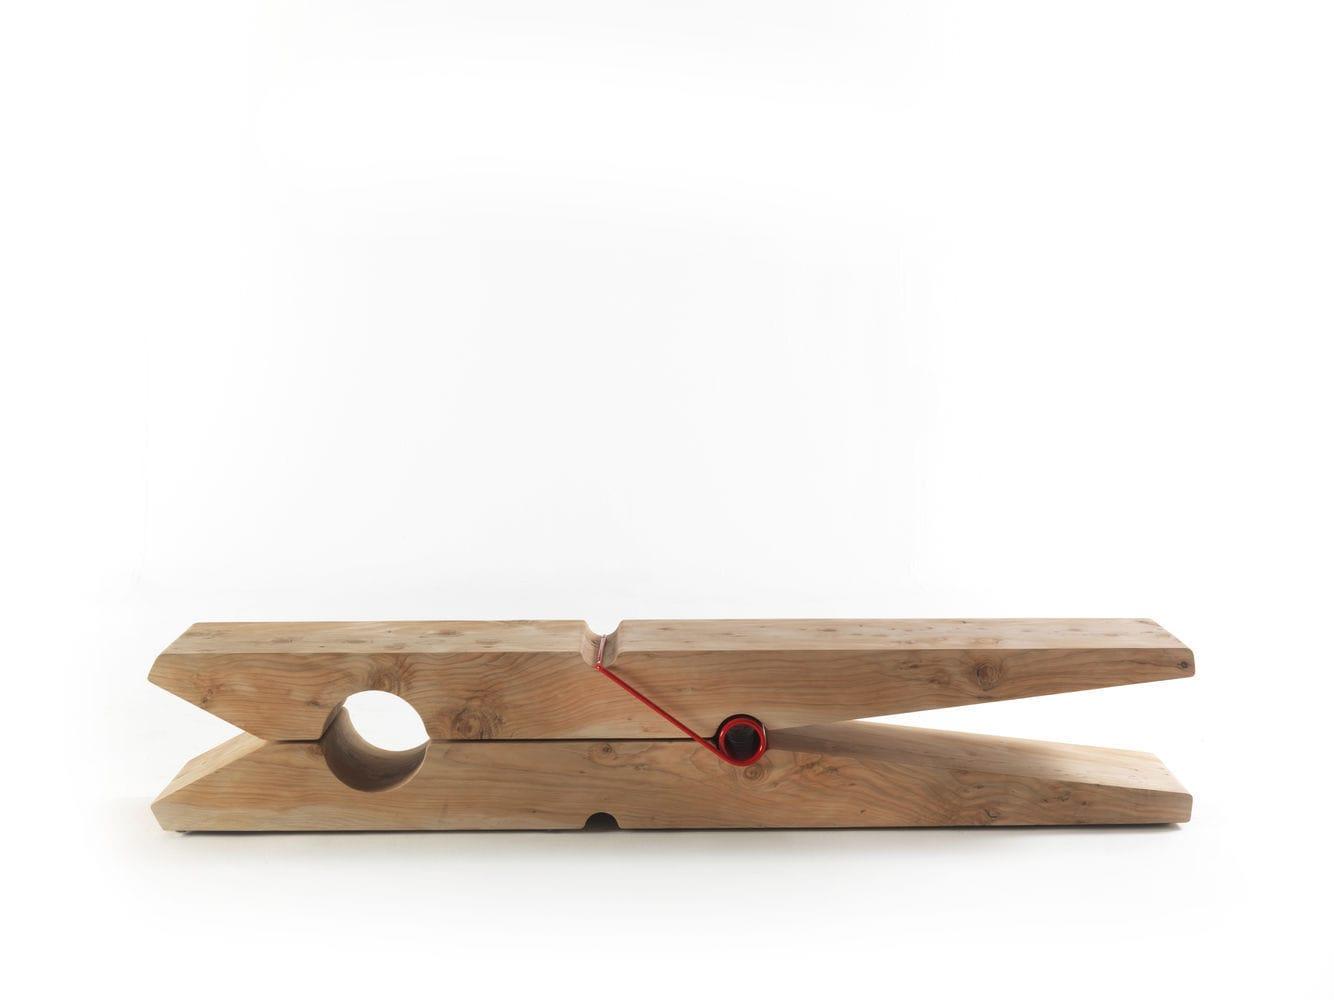 Banc de jardin / design original / en bois massif / en cèdre ...